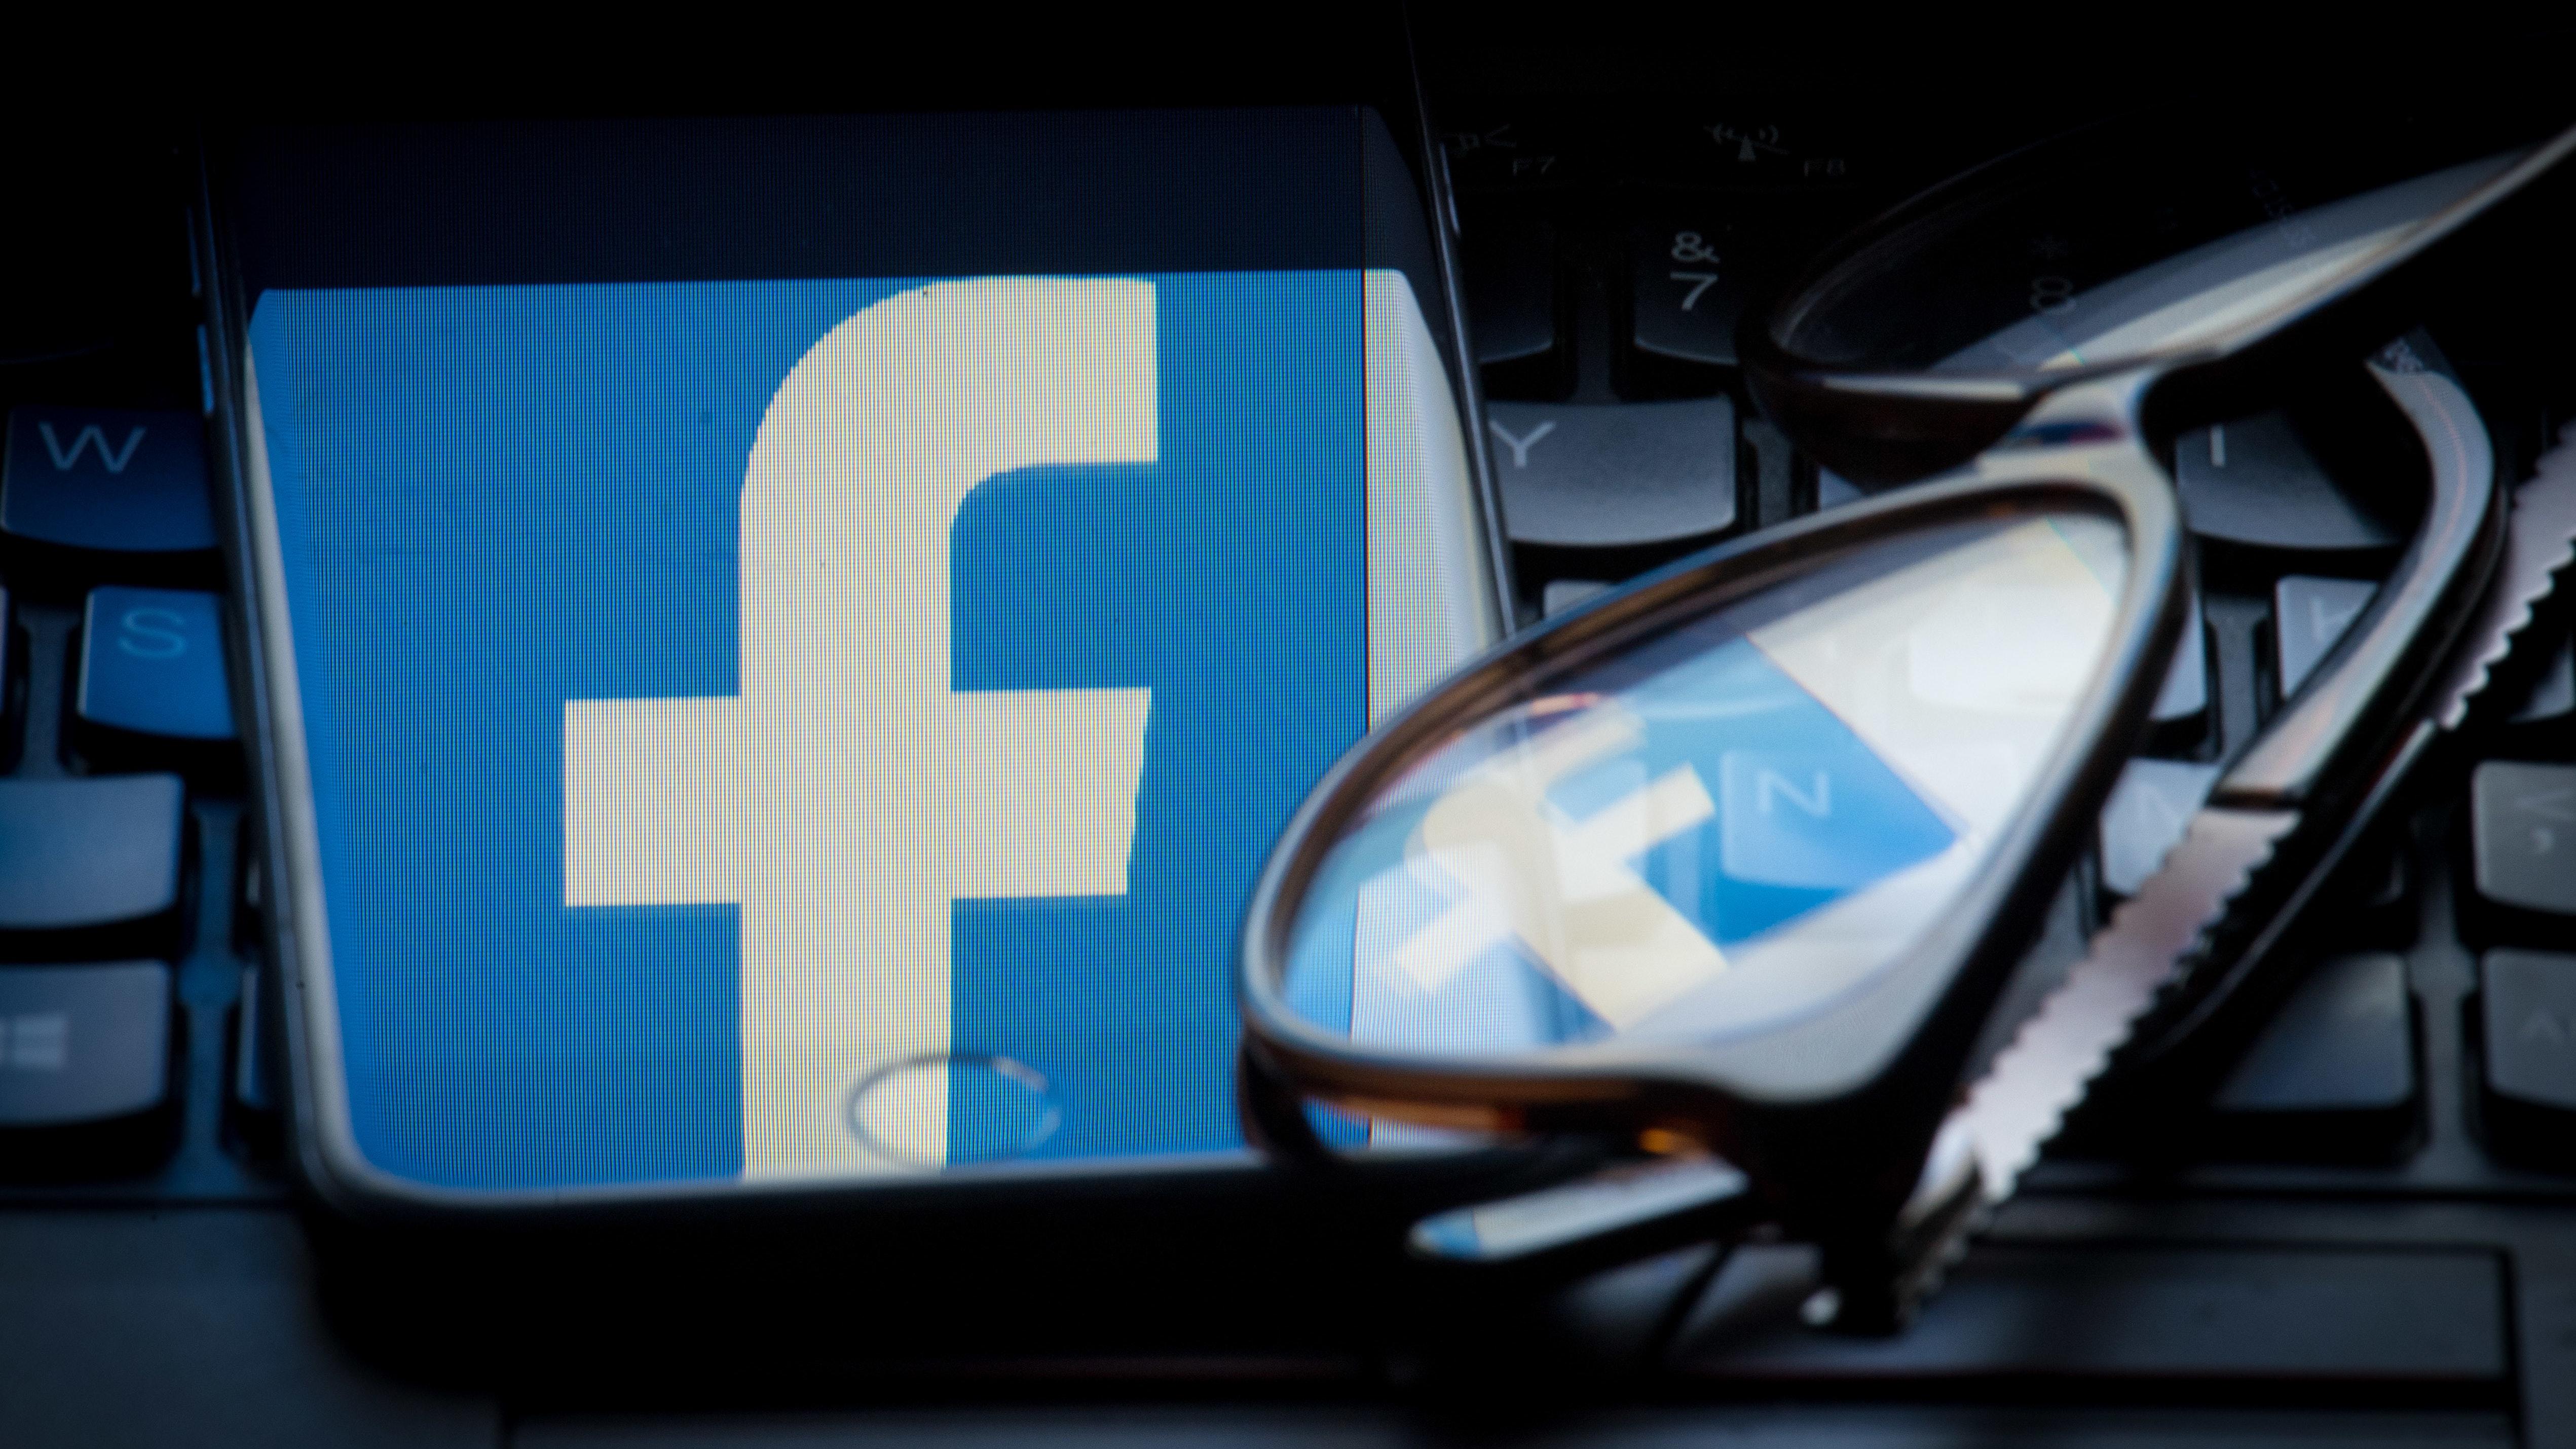 Developers access Facebook data